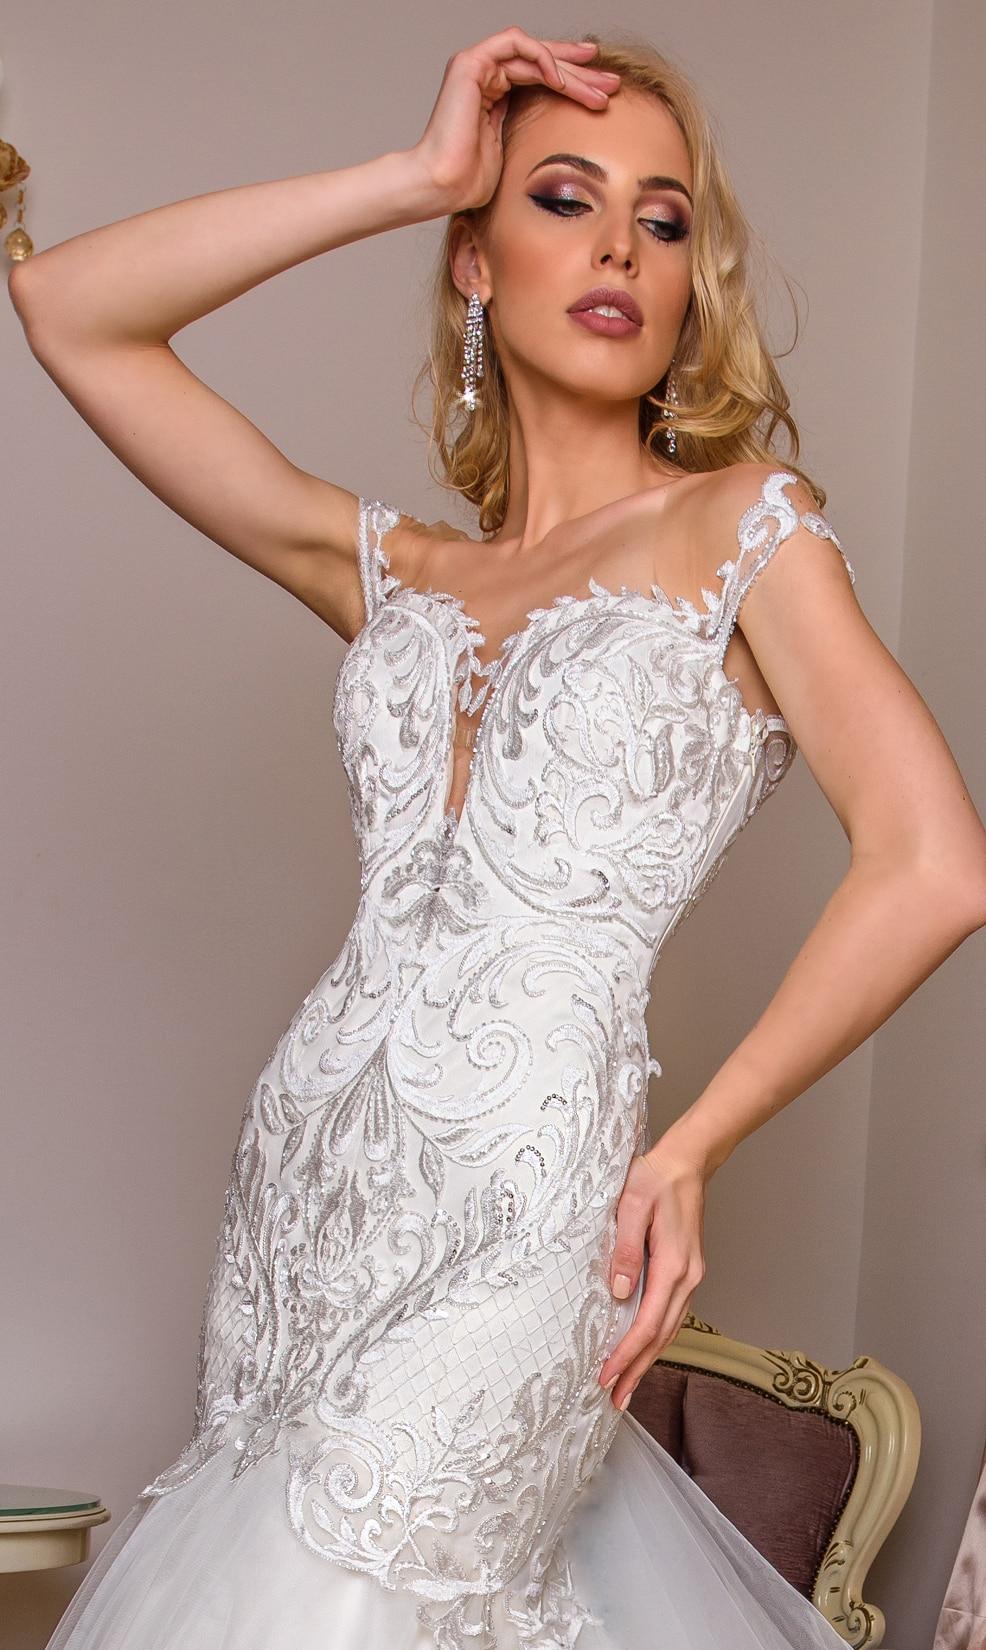 Noelle Model - Colectia Baroque - Adora Sposa (3)